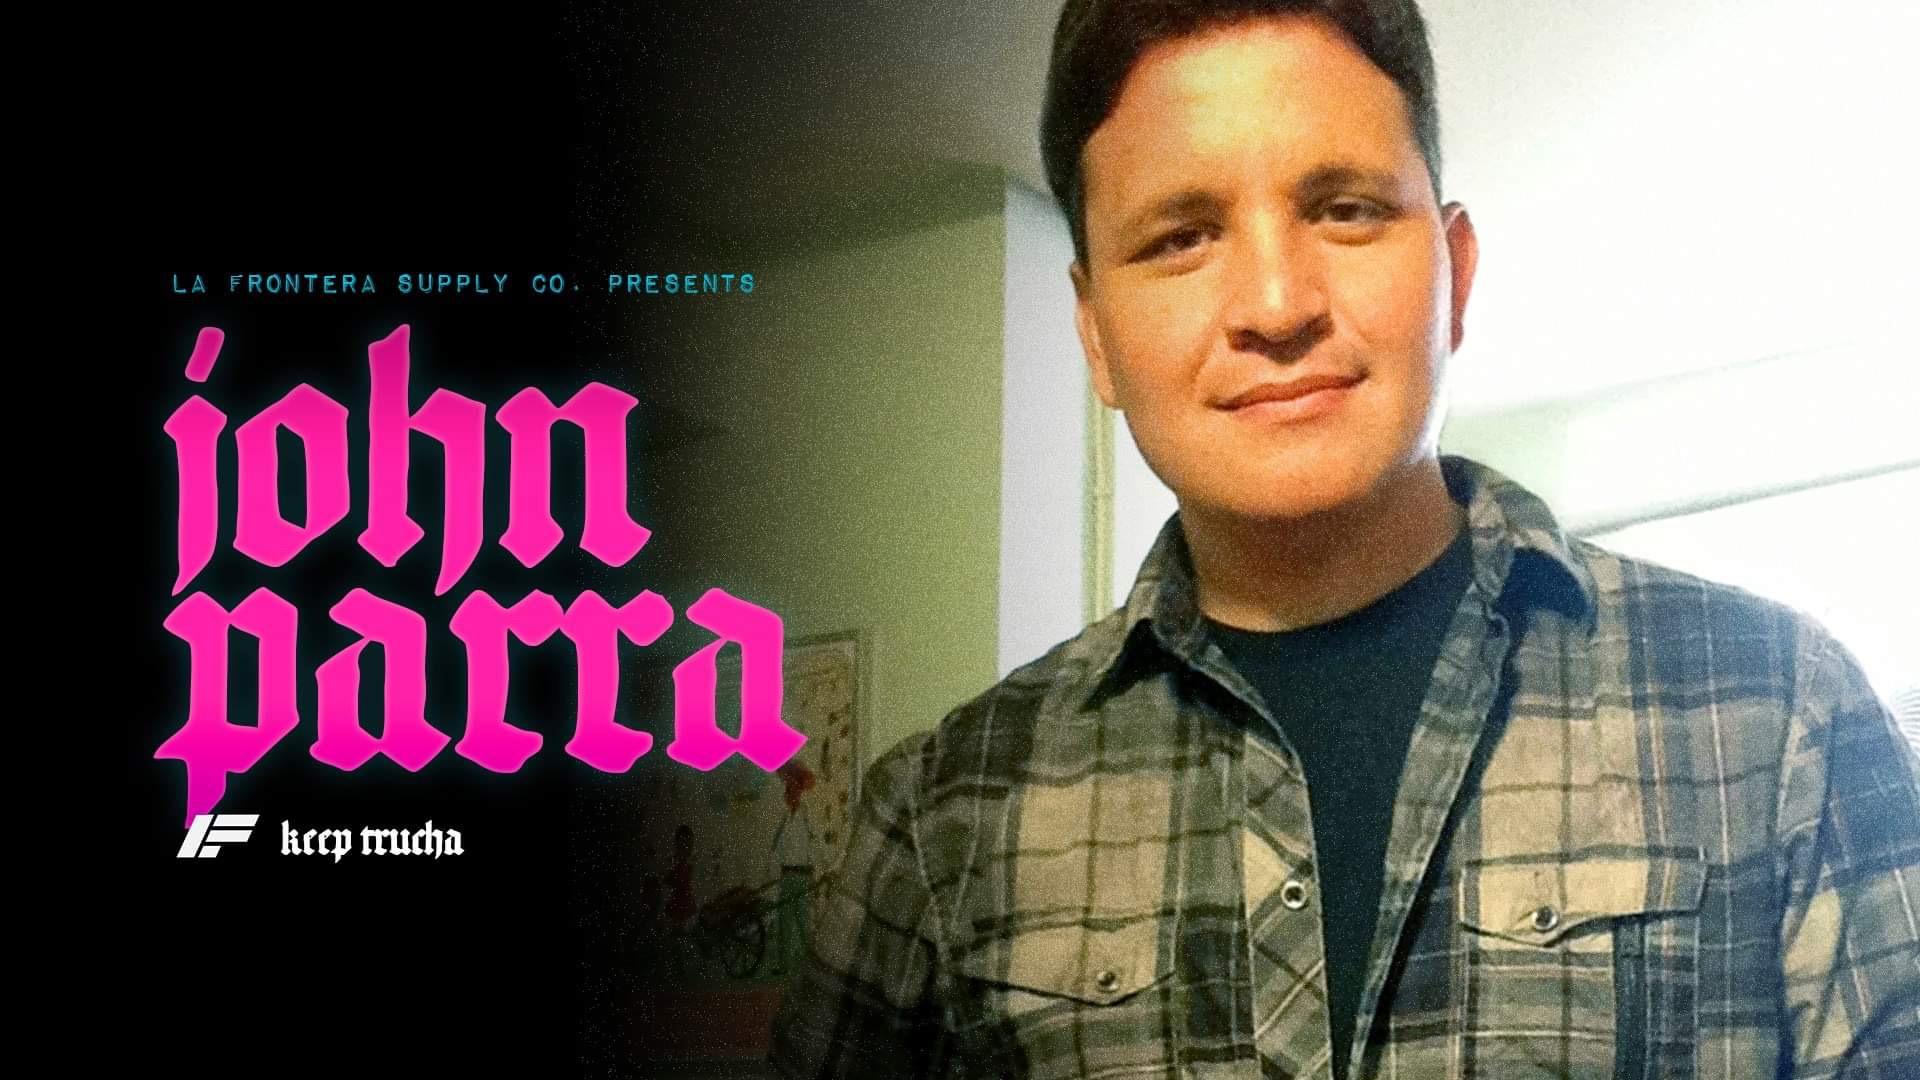 John Parra: Finding Your Voice Through Art - Keep Trucha | Episode 007March 12, 2019